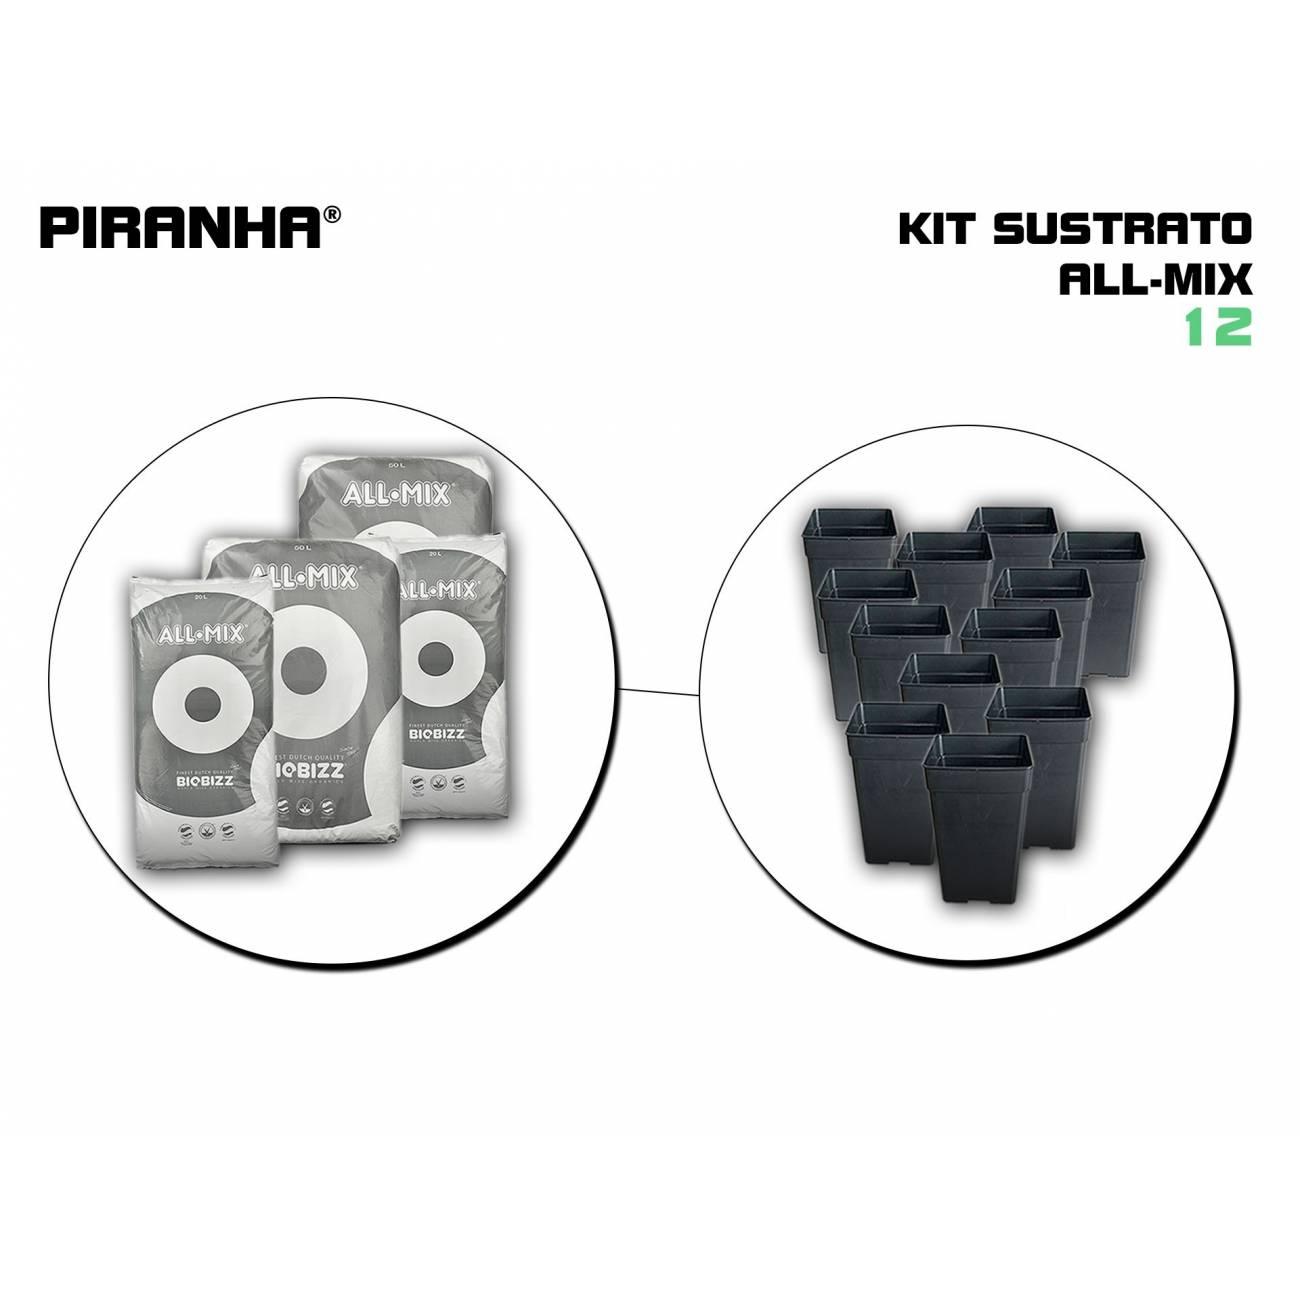 Kit Sustrato 12 All Mix